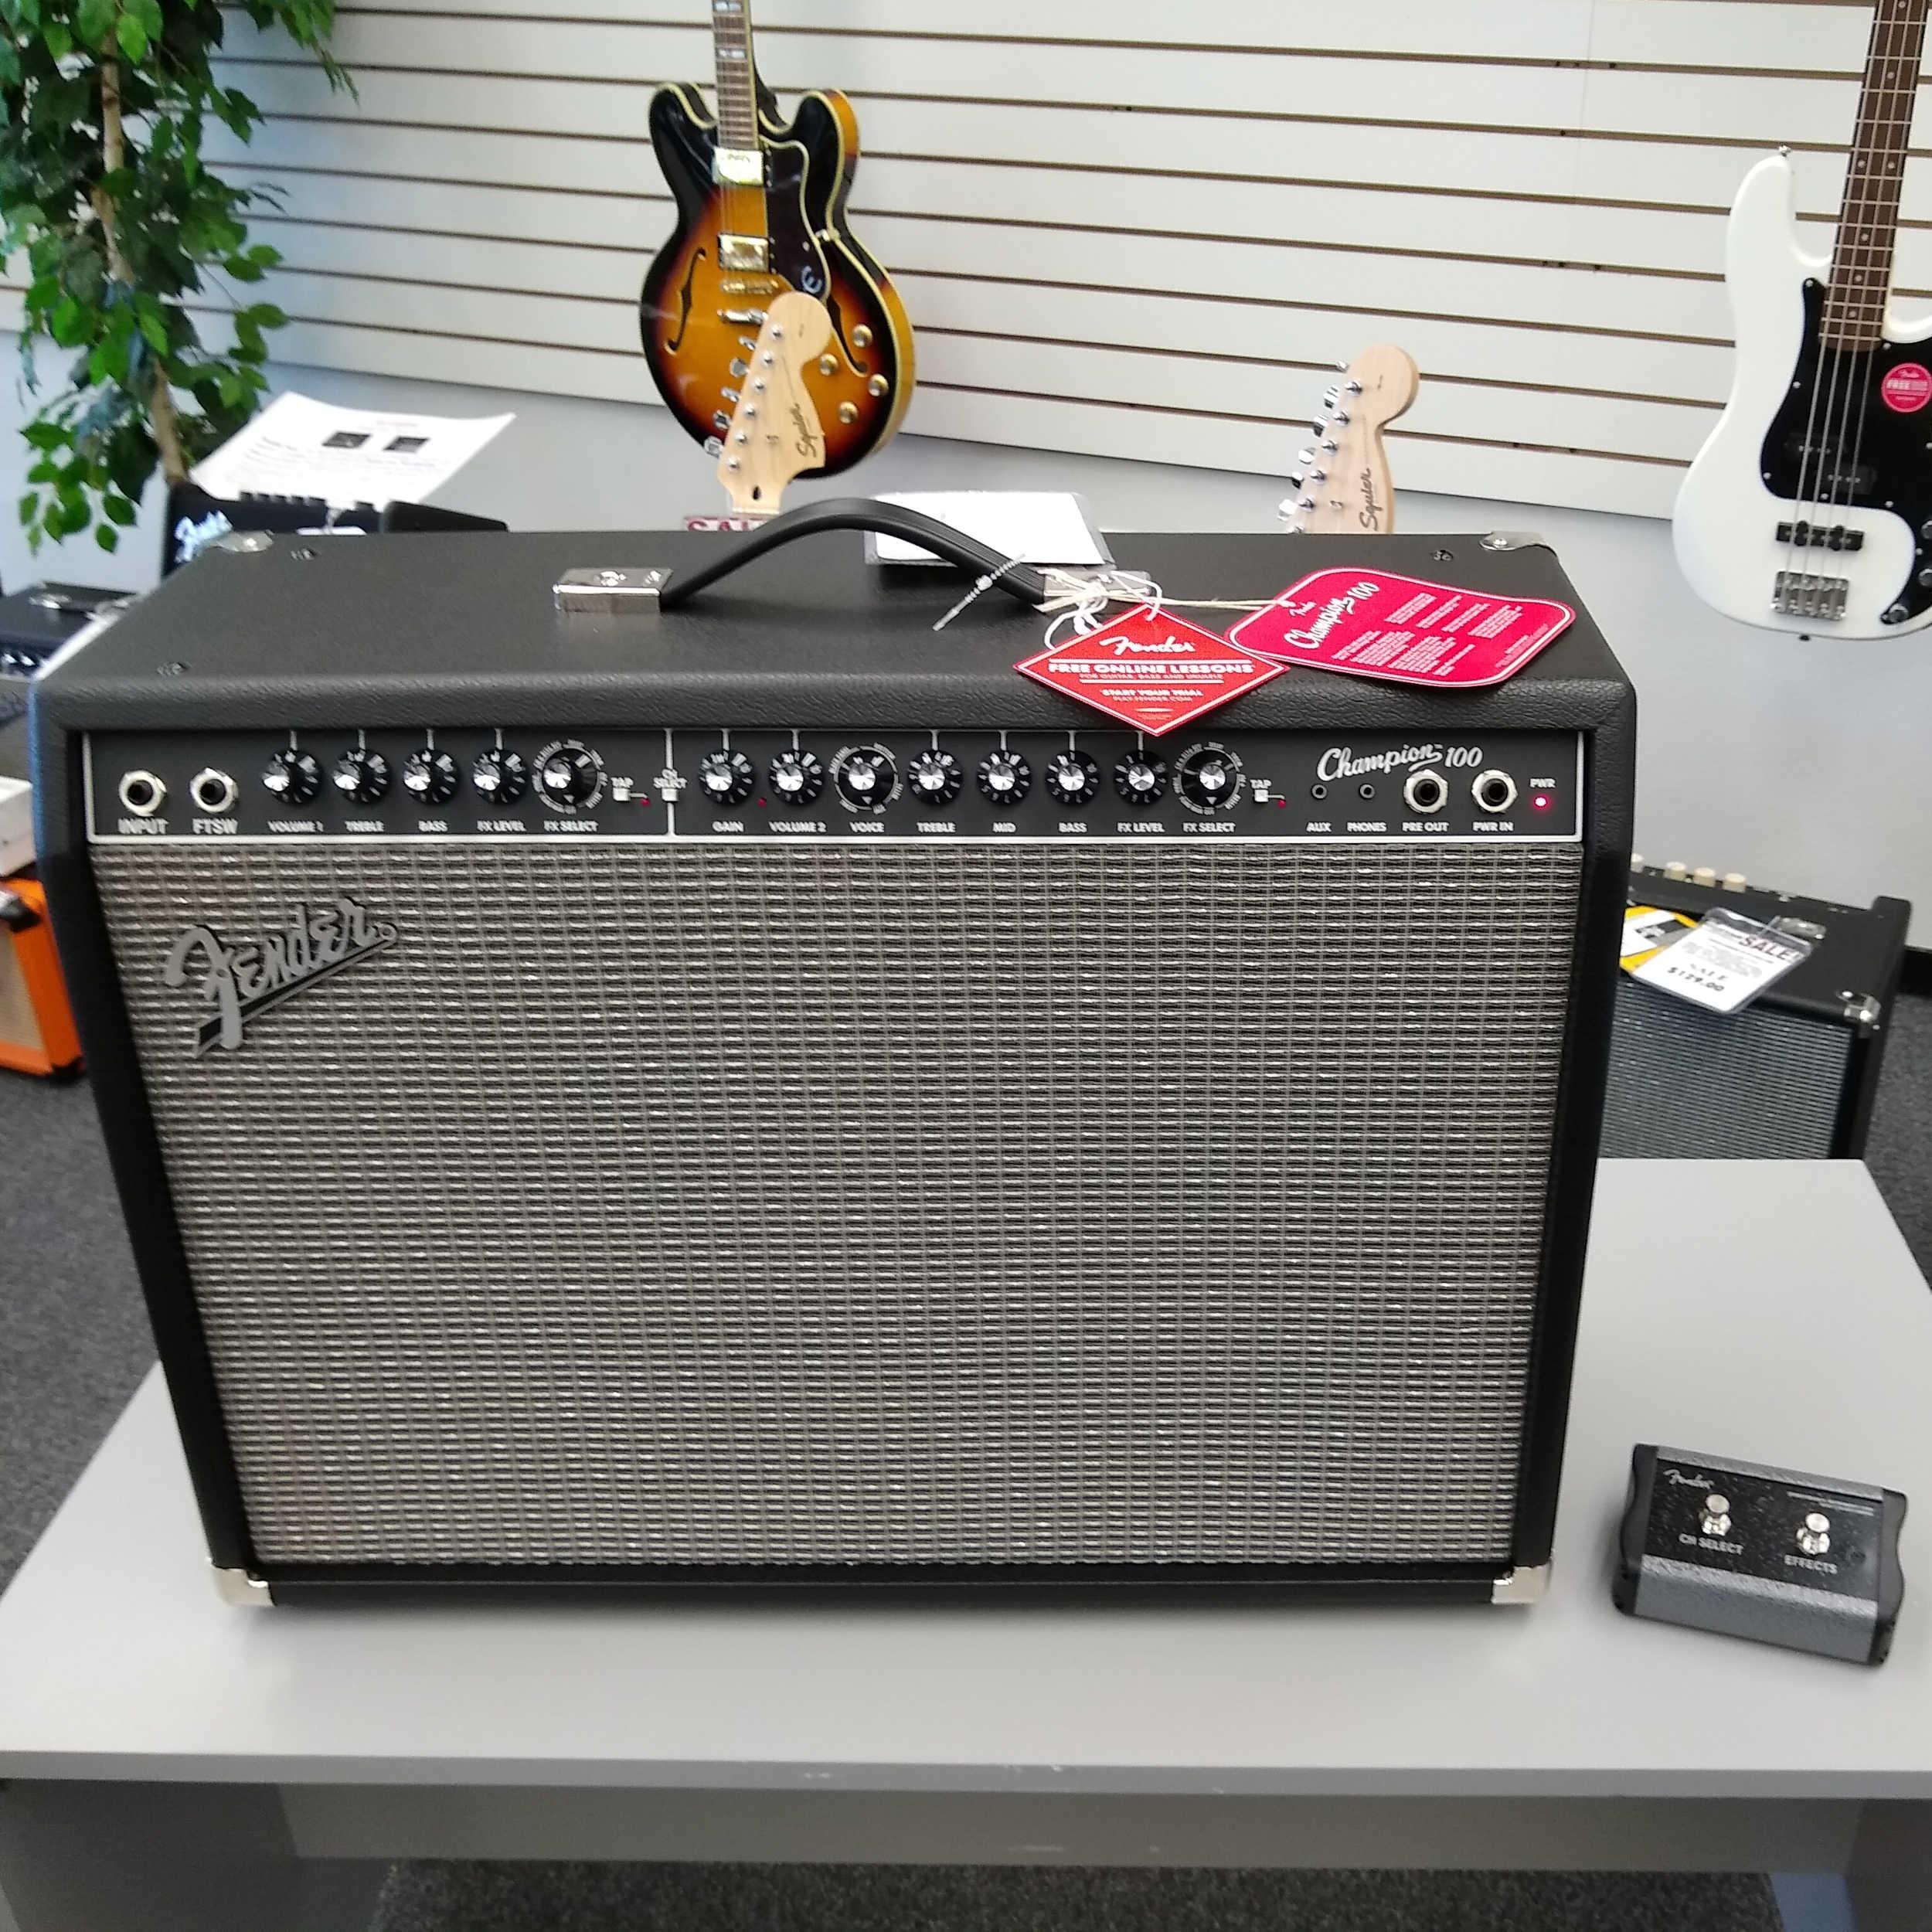 Fender Champion 100 Amplifier